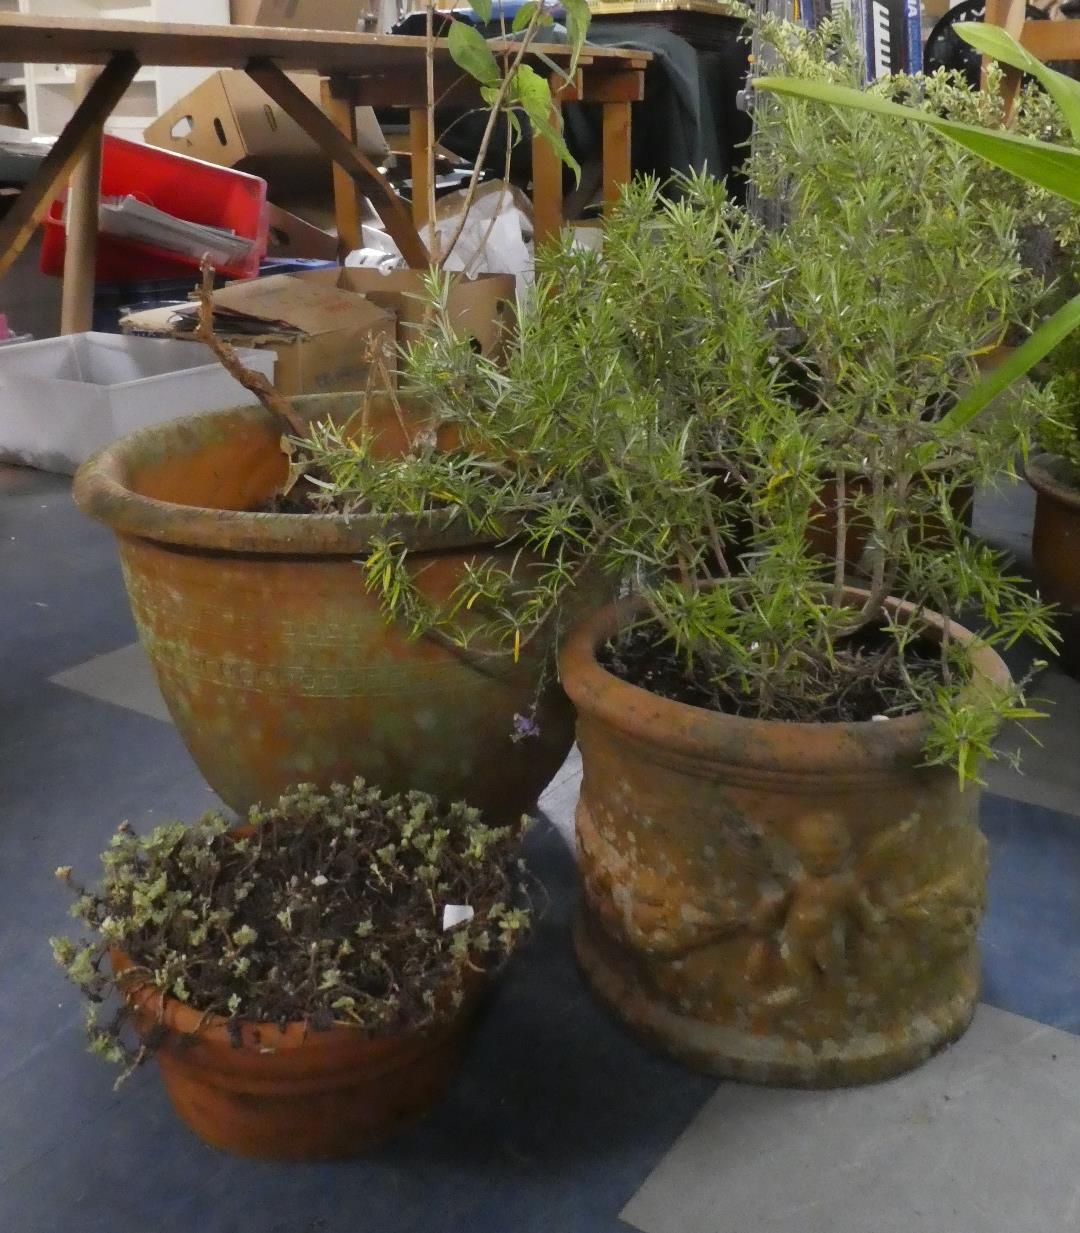 Lot 460 - Three Terracotta Patio Plant Pots, Largest 47cms Diameter